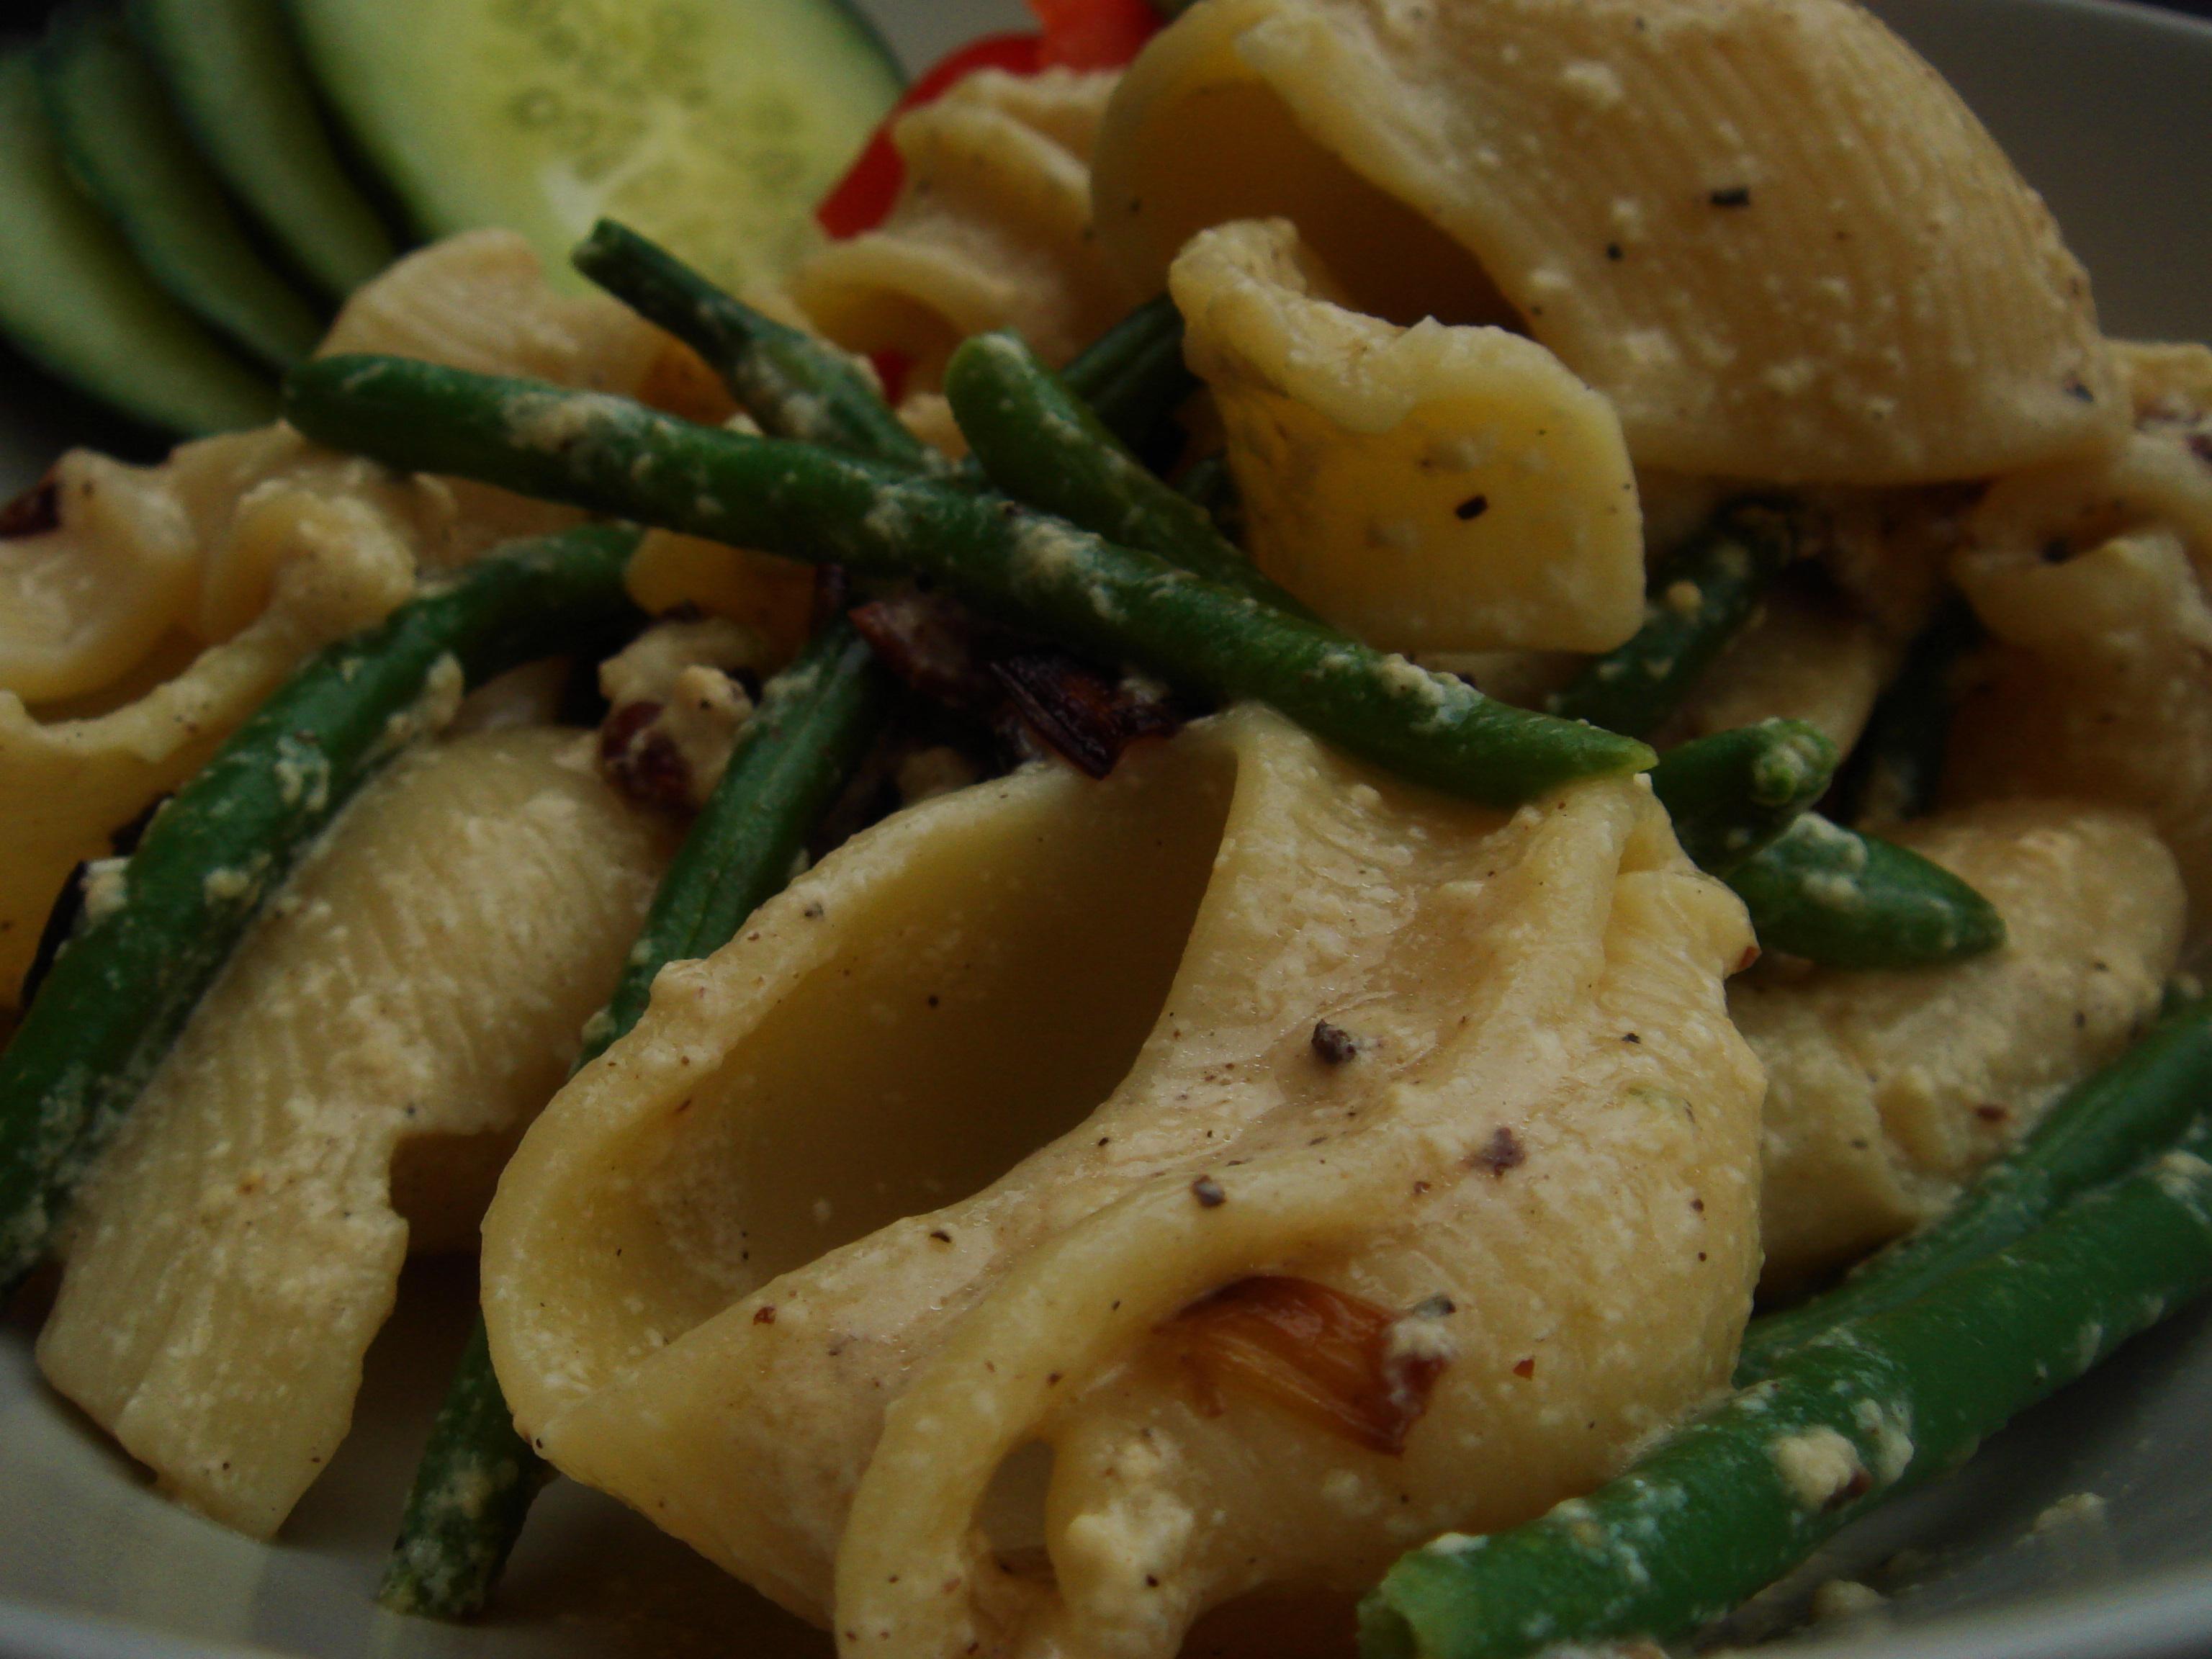 enkel pasta carbonara utan lök